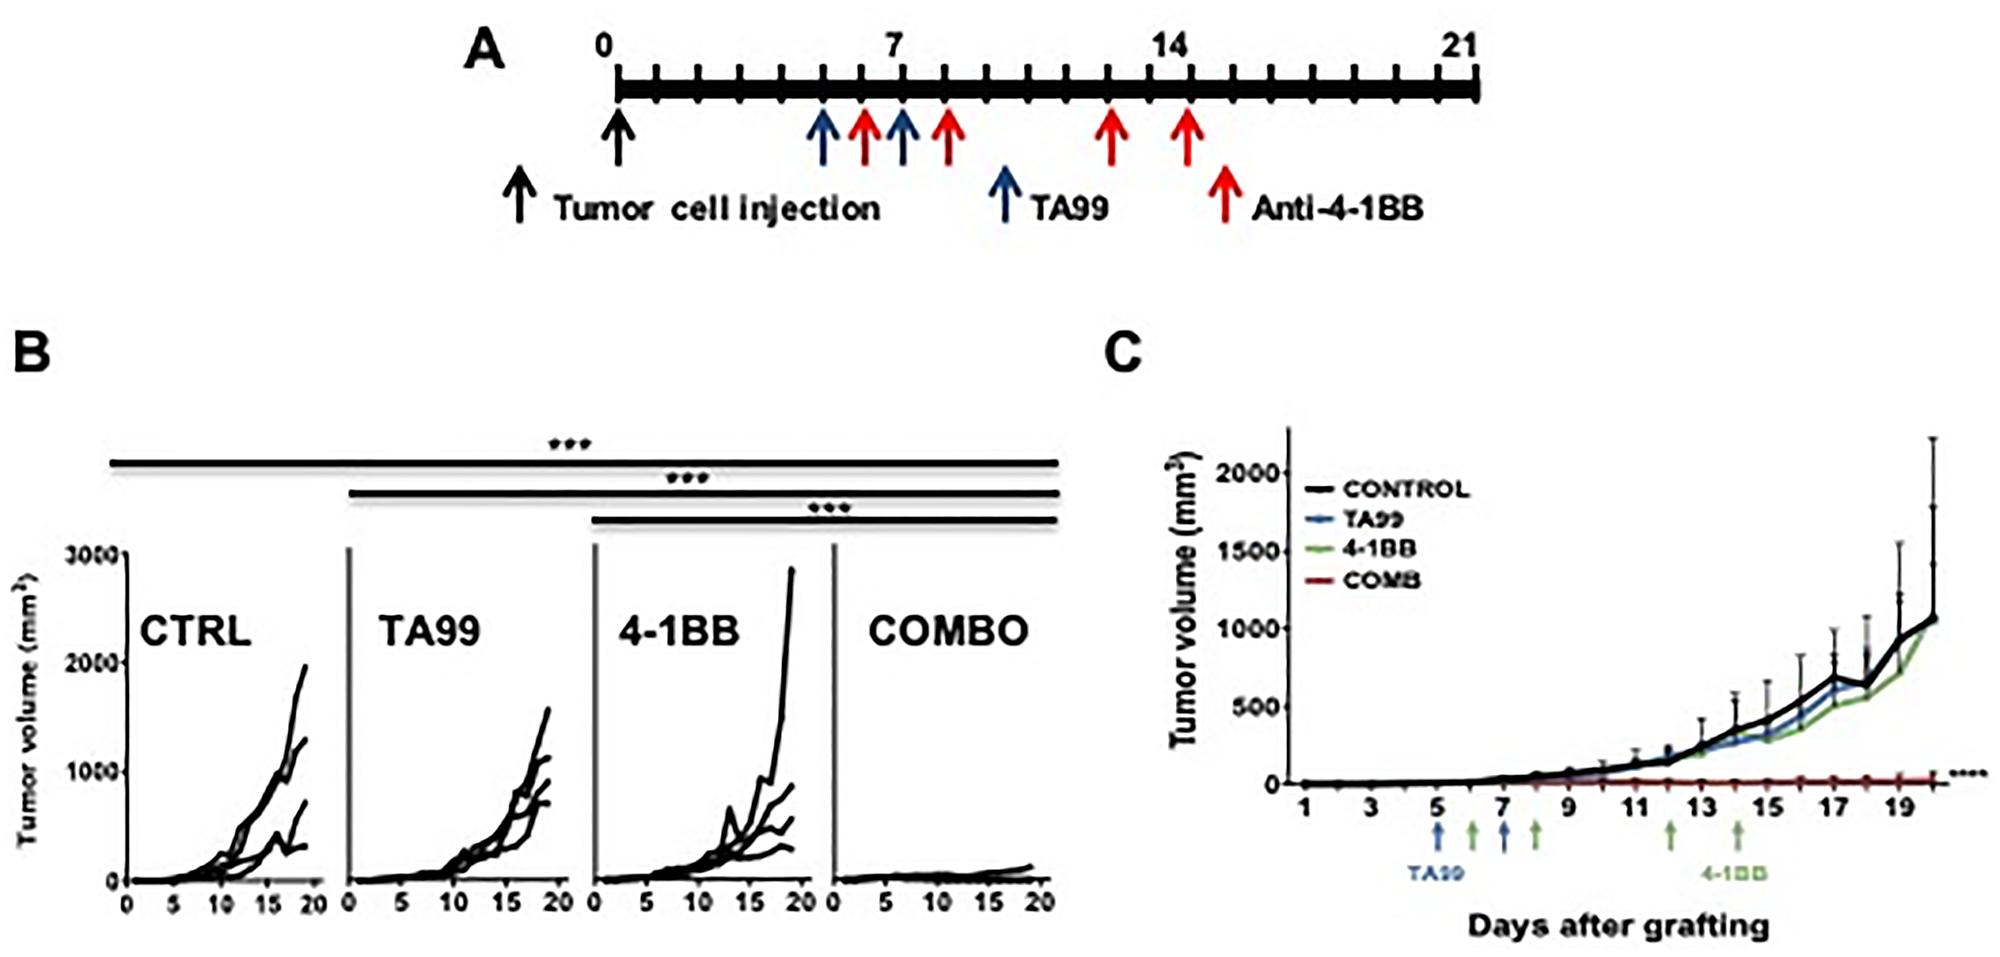 Anti-4-1BB/CD137 agonistic mAb enhanced the anti-tumor effects of TA99 in B16 subcutaneous melanomas.